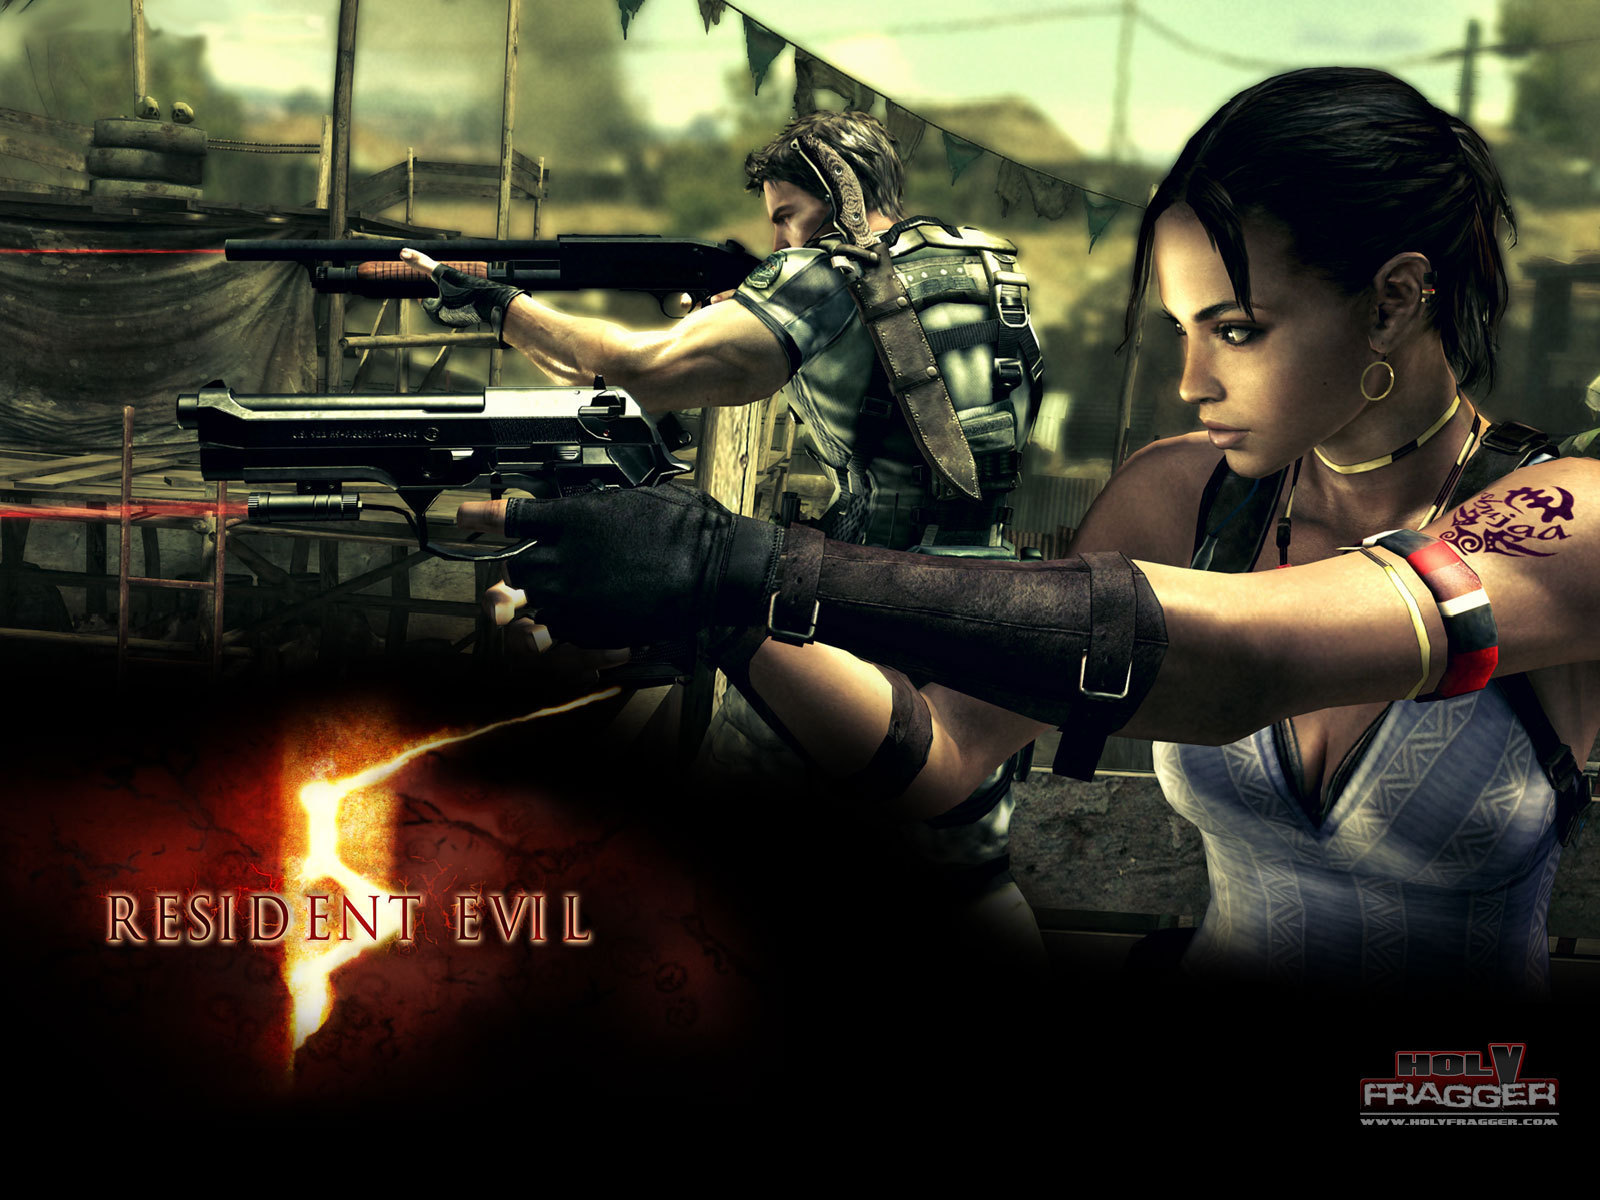 http://2.bp.blogspot.com/-8--MhDLyDEI/UOqdAMuA5nI/AAAAAAAACv4/oAvaJTyr6Uw/s1600/Resident-Evil-Wallpaper-resident-evil-5-4931735-1600-1200.jpg